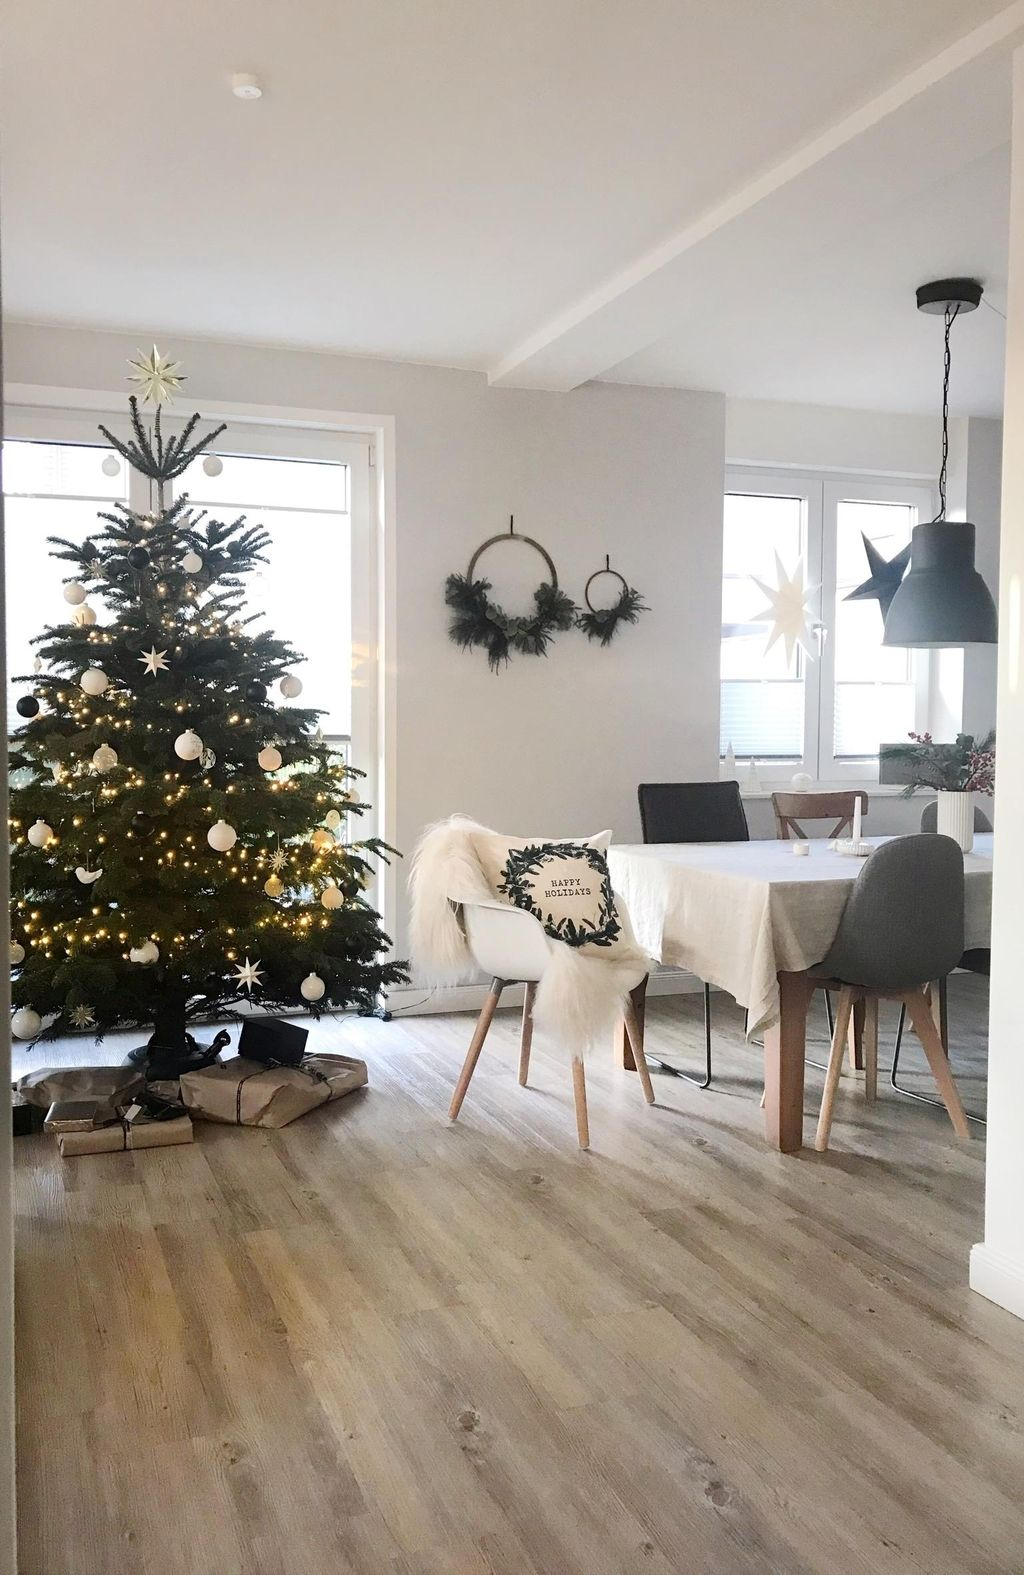 Weihnachten 2018 #christmastime #christmastree #christmasishere #cozyhome #allisbright #weihnachtsdekoration